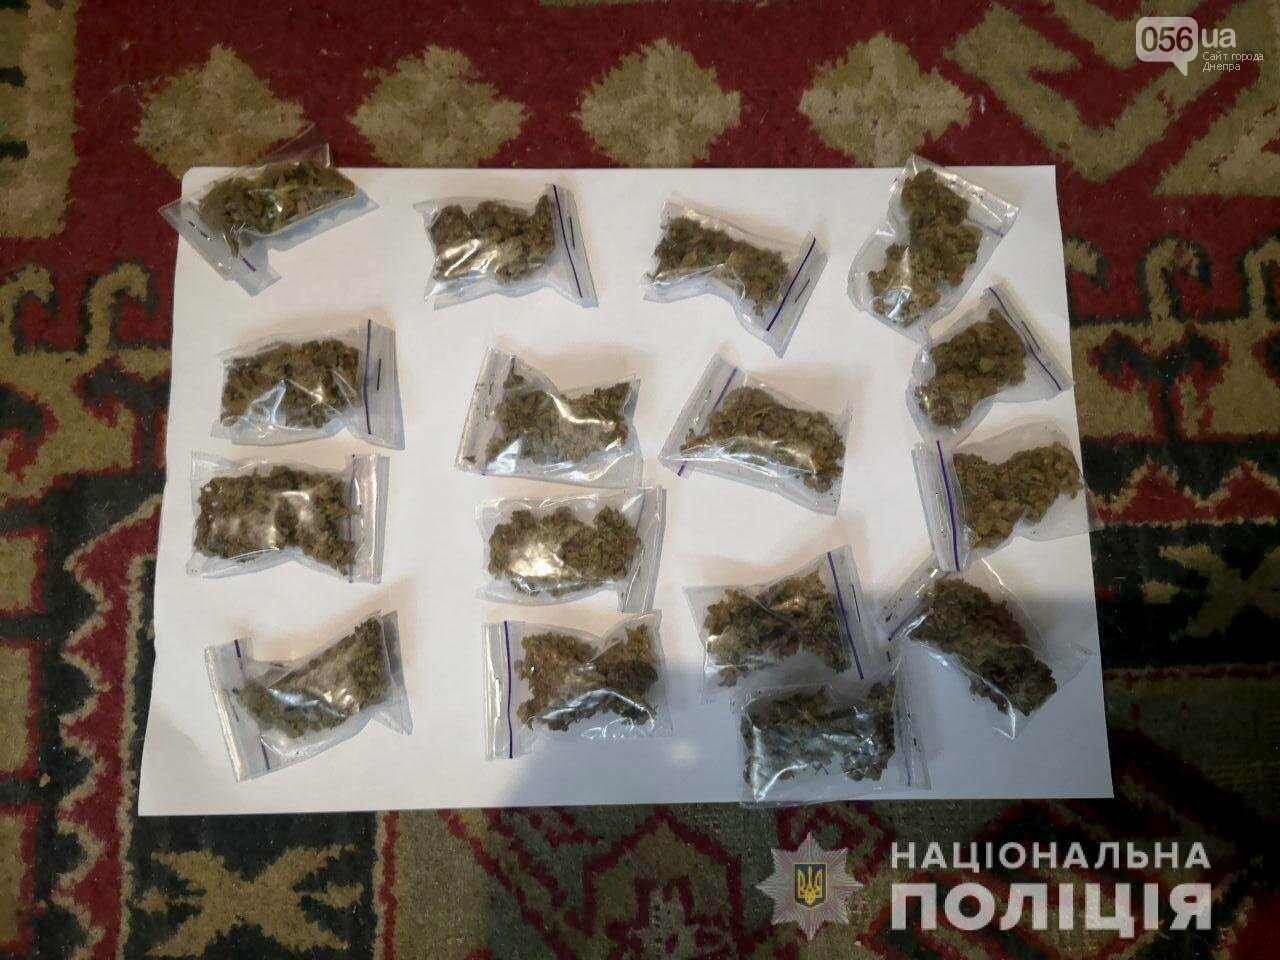 На Днепропетровщине задержали наркоторговцев, - ФОТО, фото-2